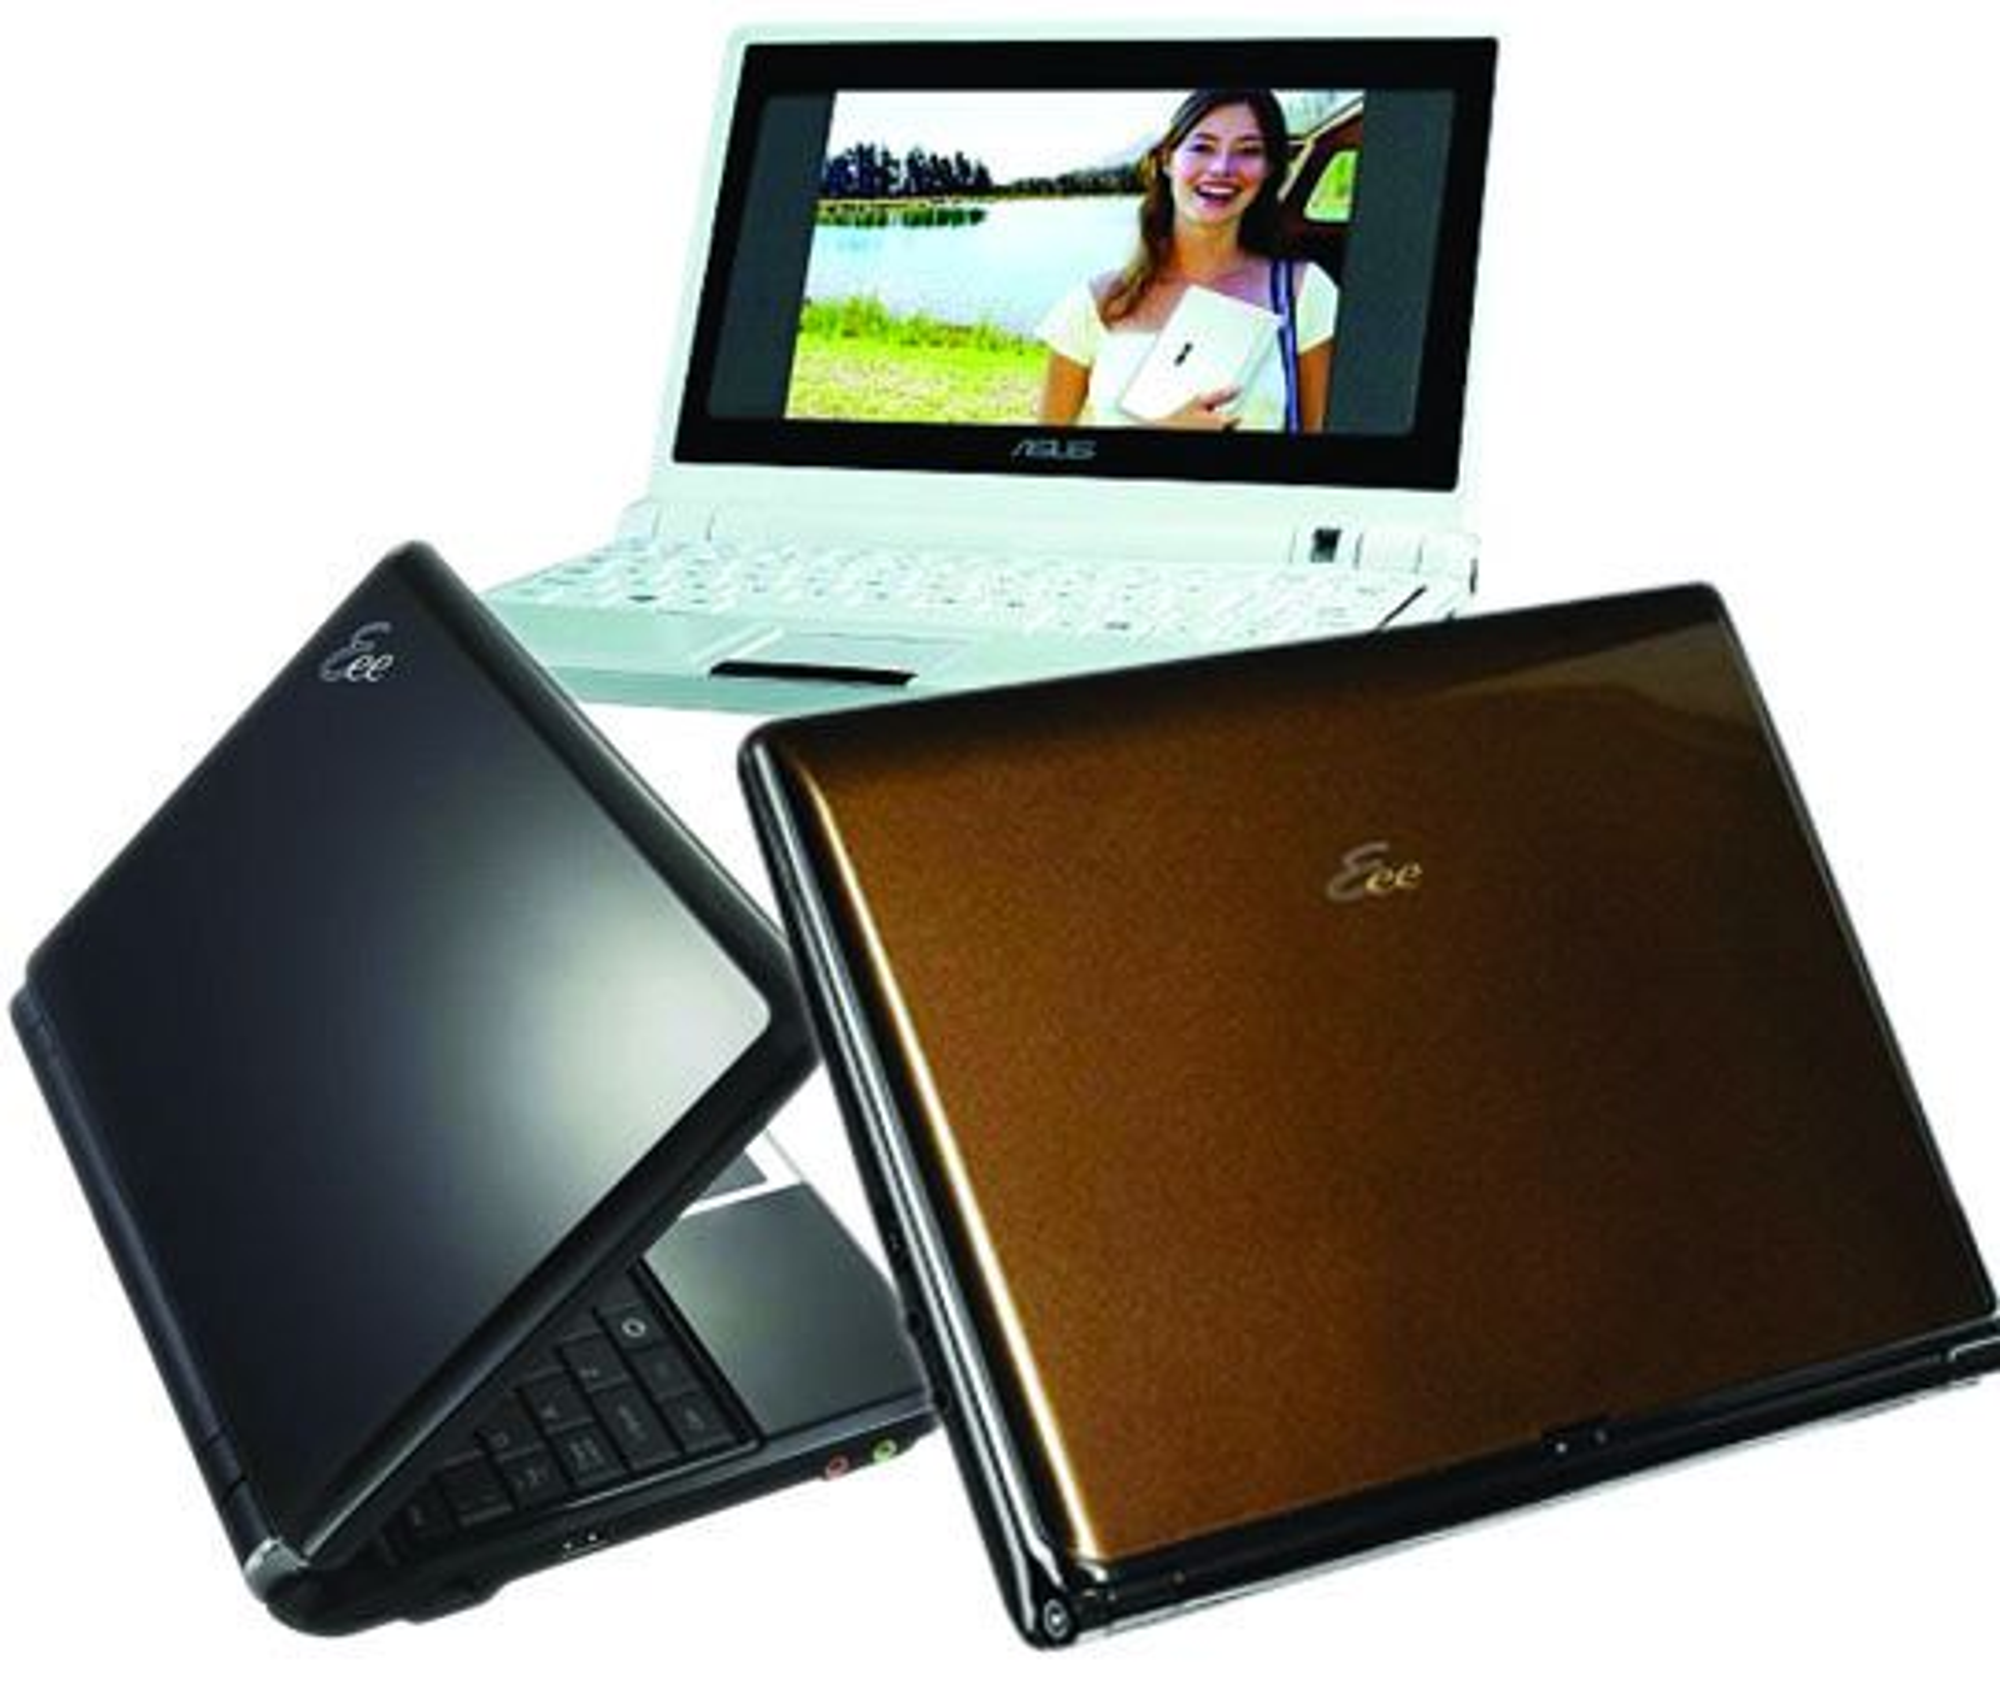 Eee PC 701, 901 og S101 vil leveres med Linux